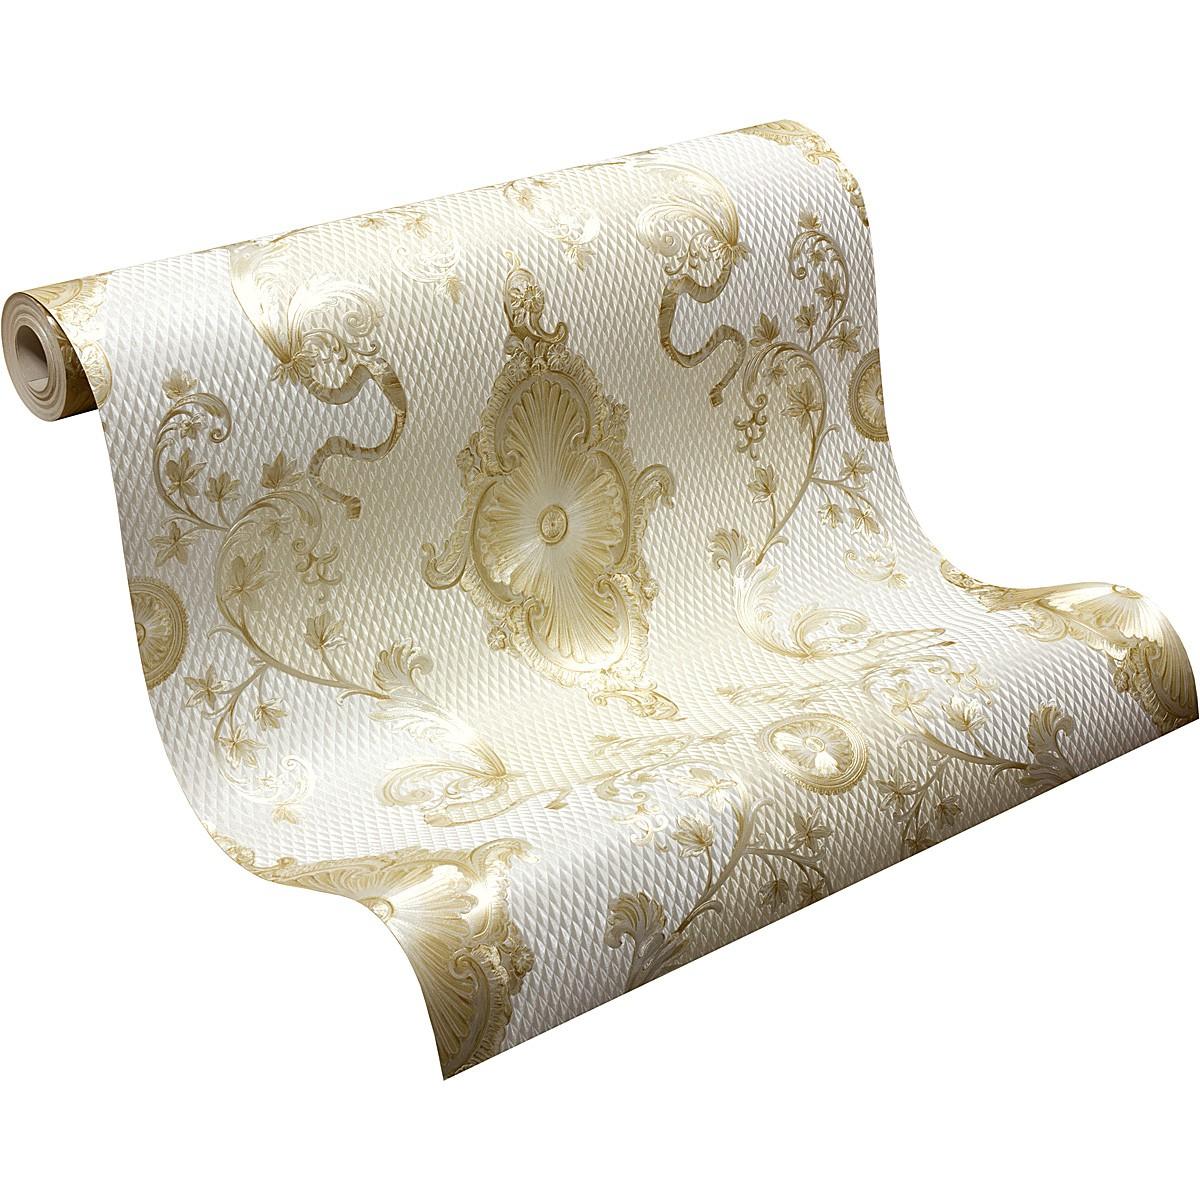 Tapete Satin Barock Glanz Hermitage creme gold 6829-63